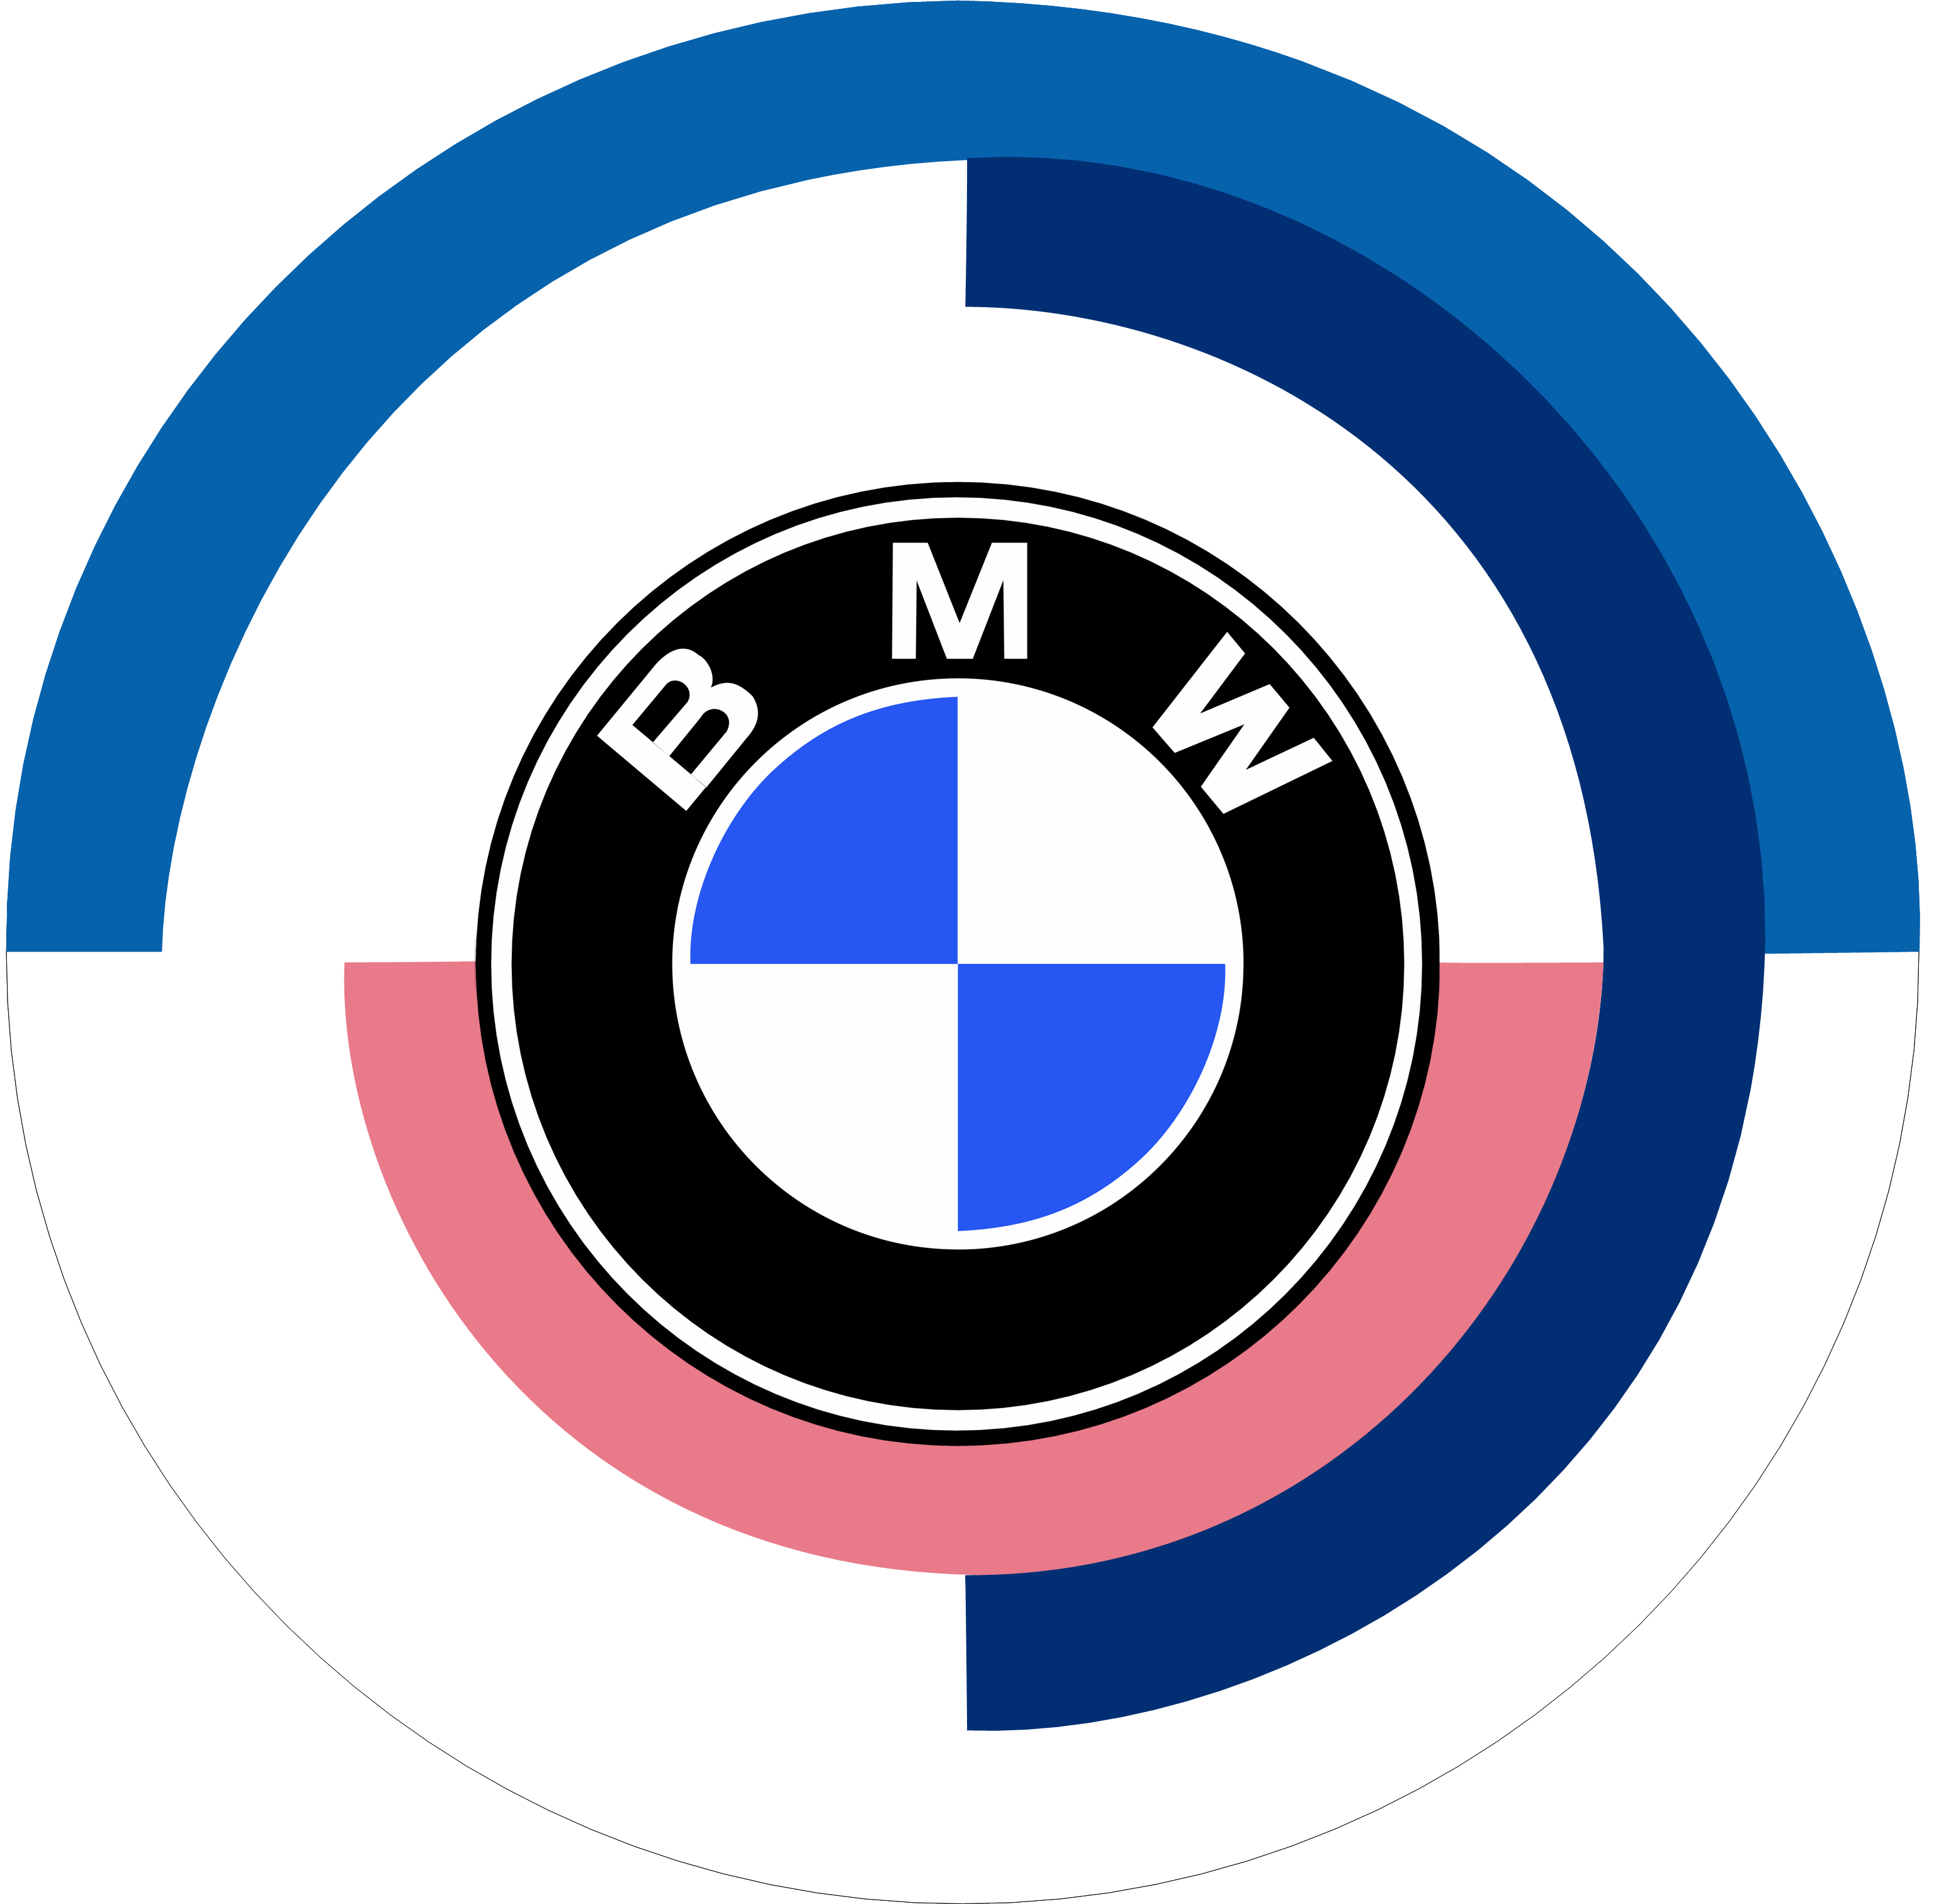 80s logos Google Search 80s logo, Bmw, Logos